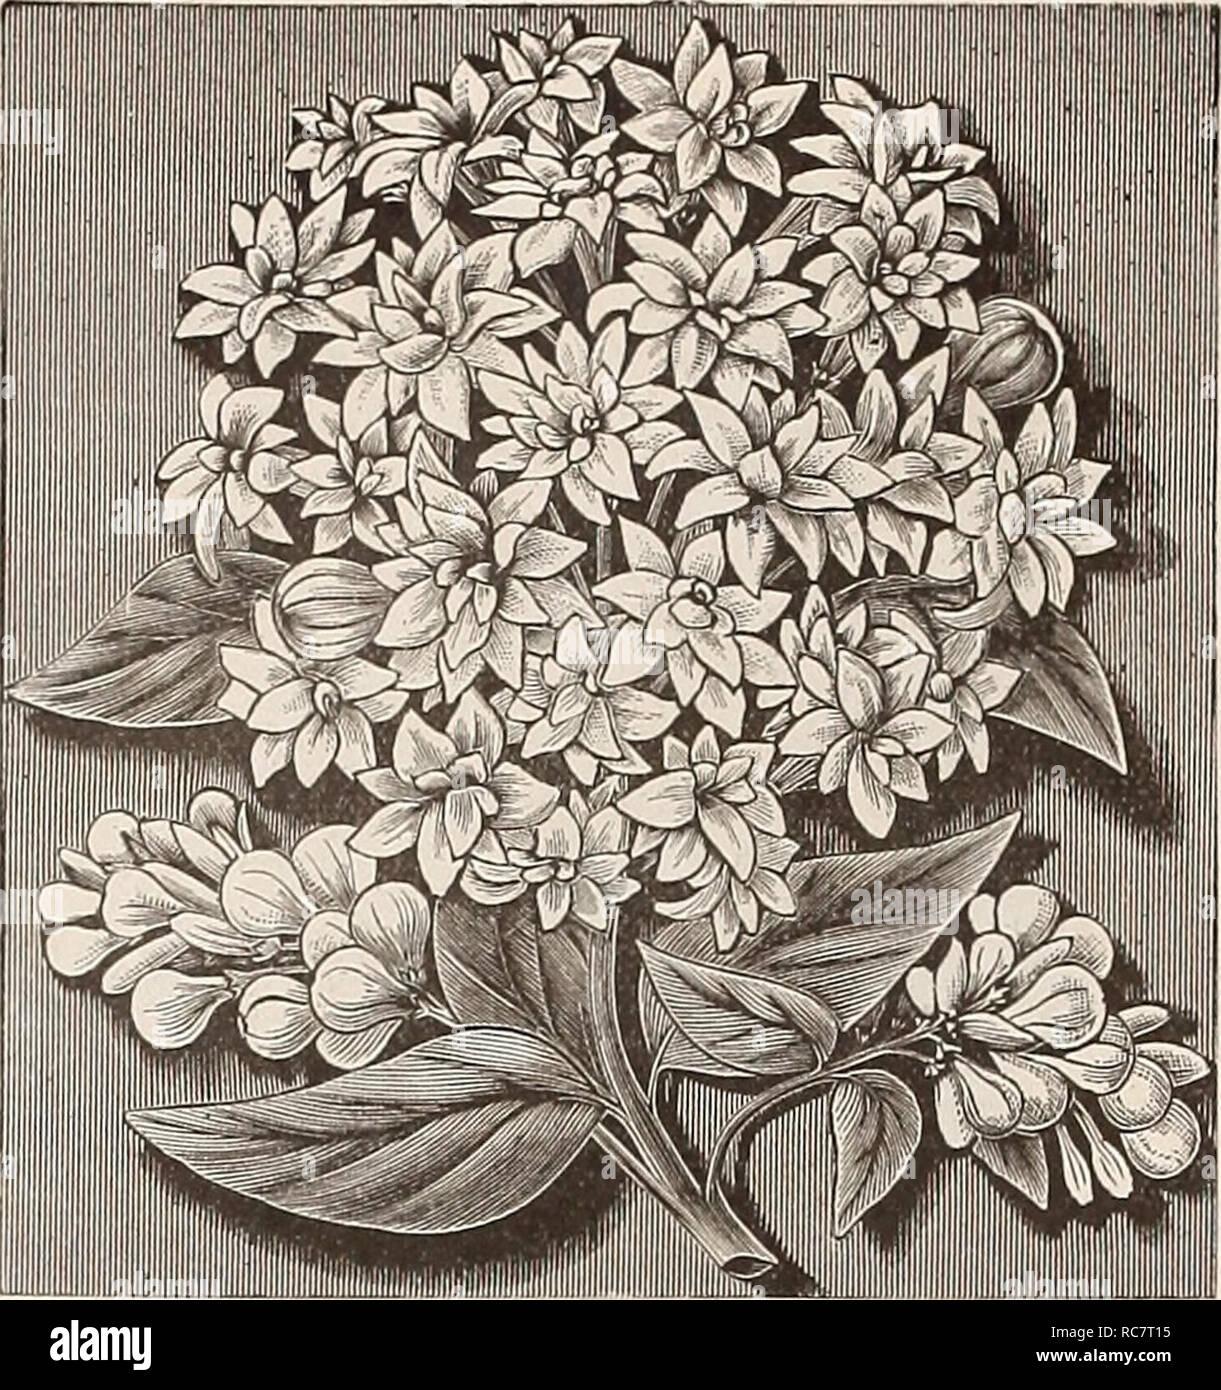 Dreer's garden calendar for 1892 : a catalogue of choice